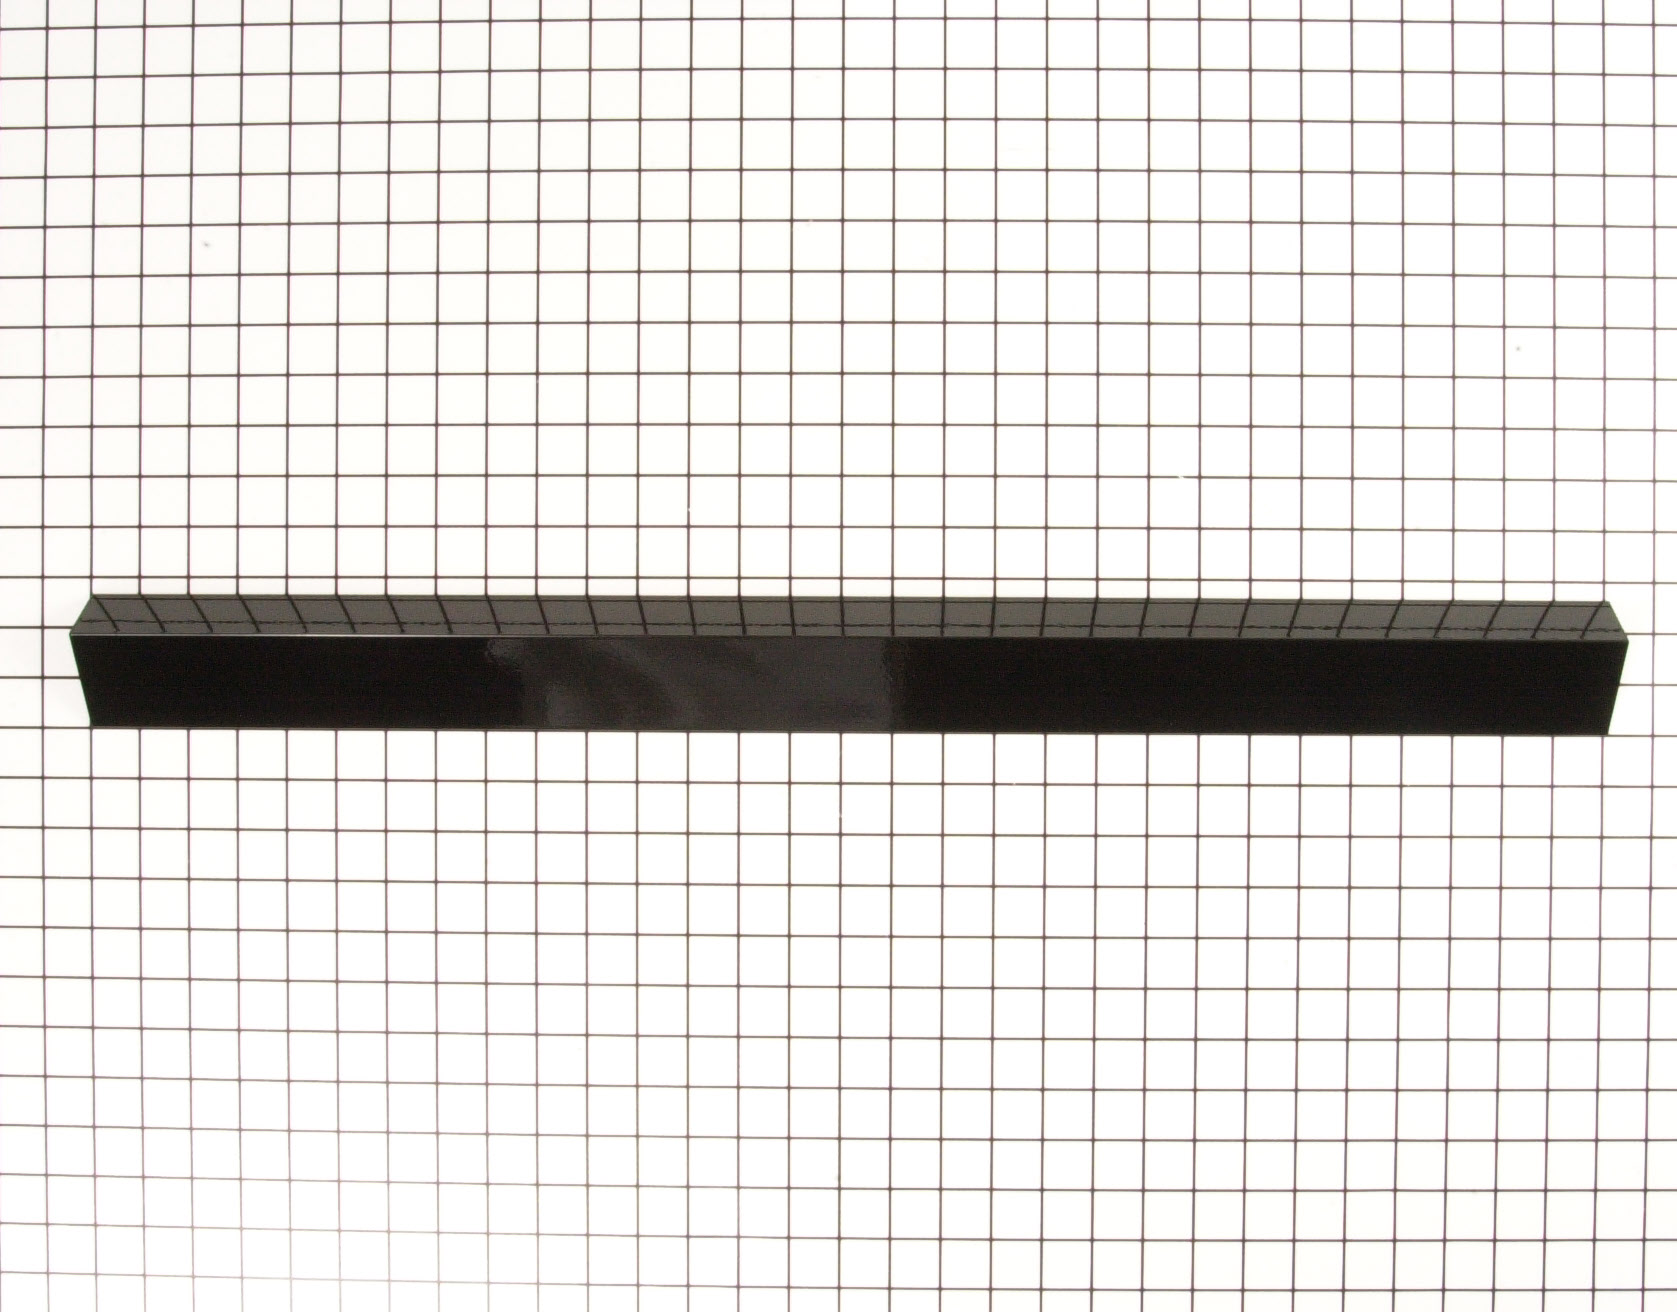 KitchenAid Range/Stove/Oven Part # W10113902A - Top Trim